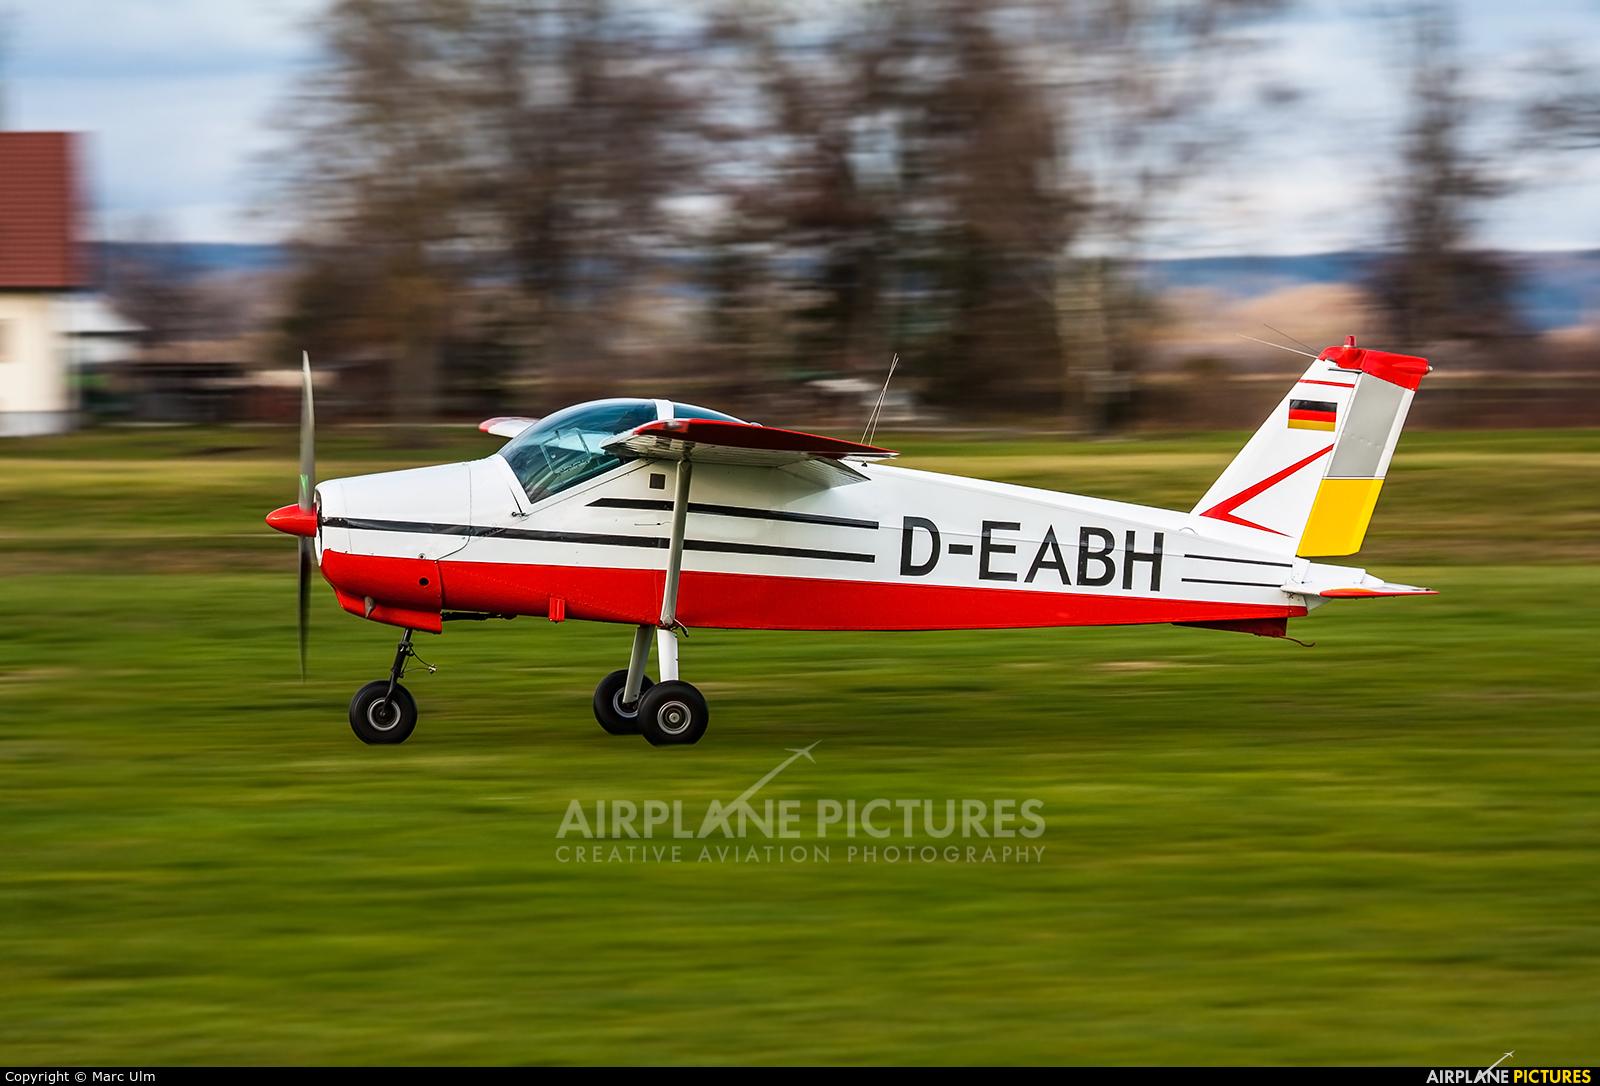 Private D-EABH aircraft at Günzburg-Donauried